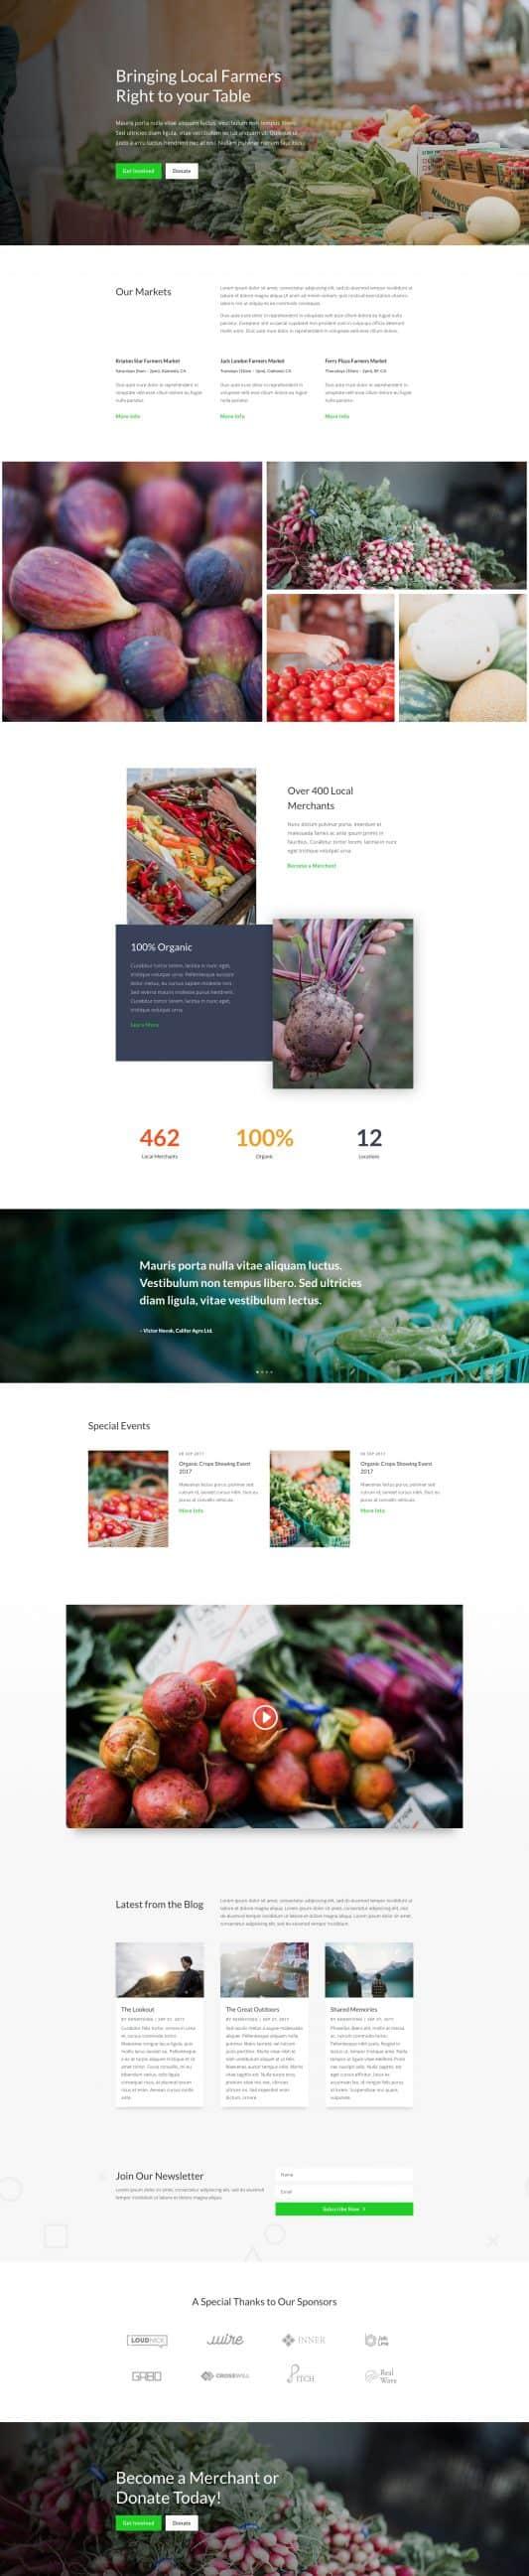 Farmers Market Web Design 7